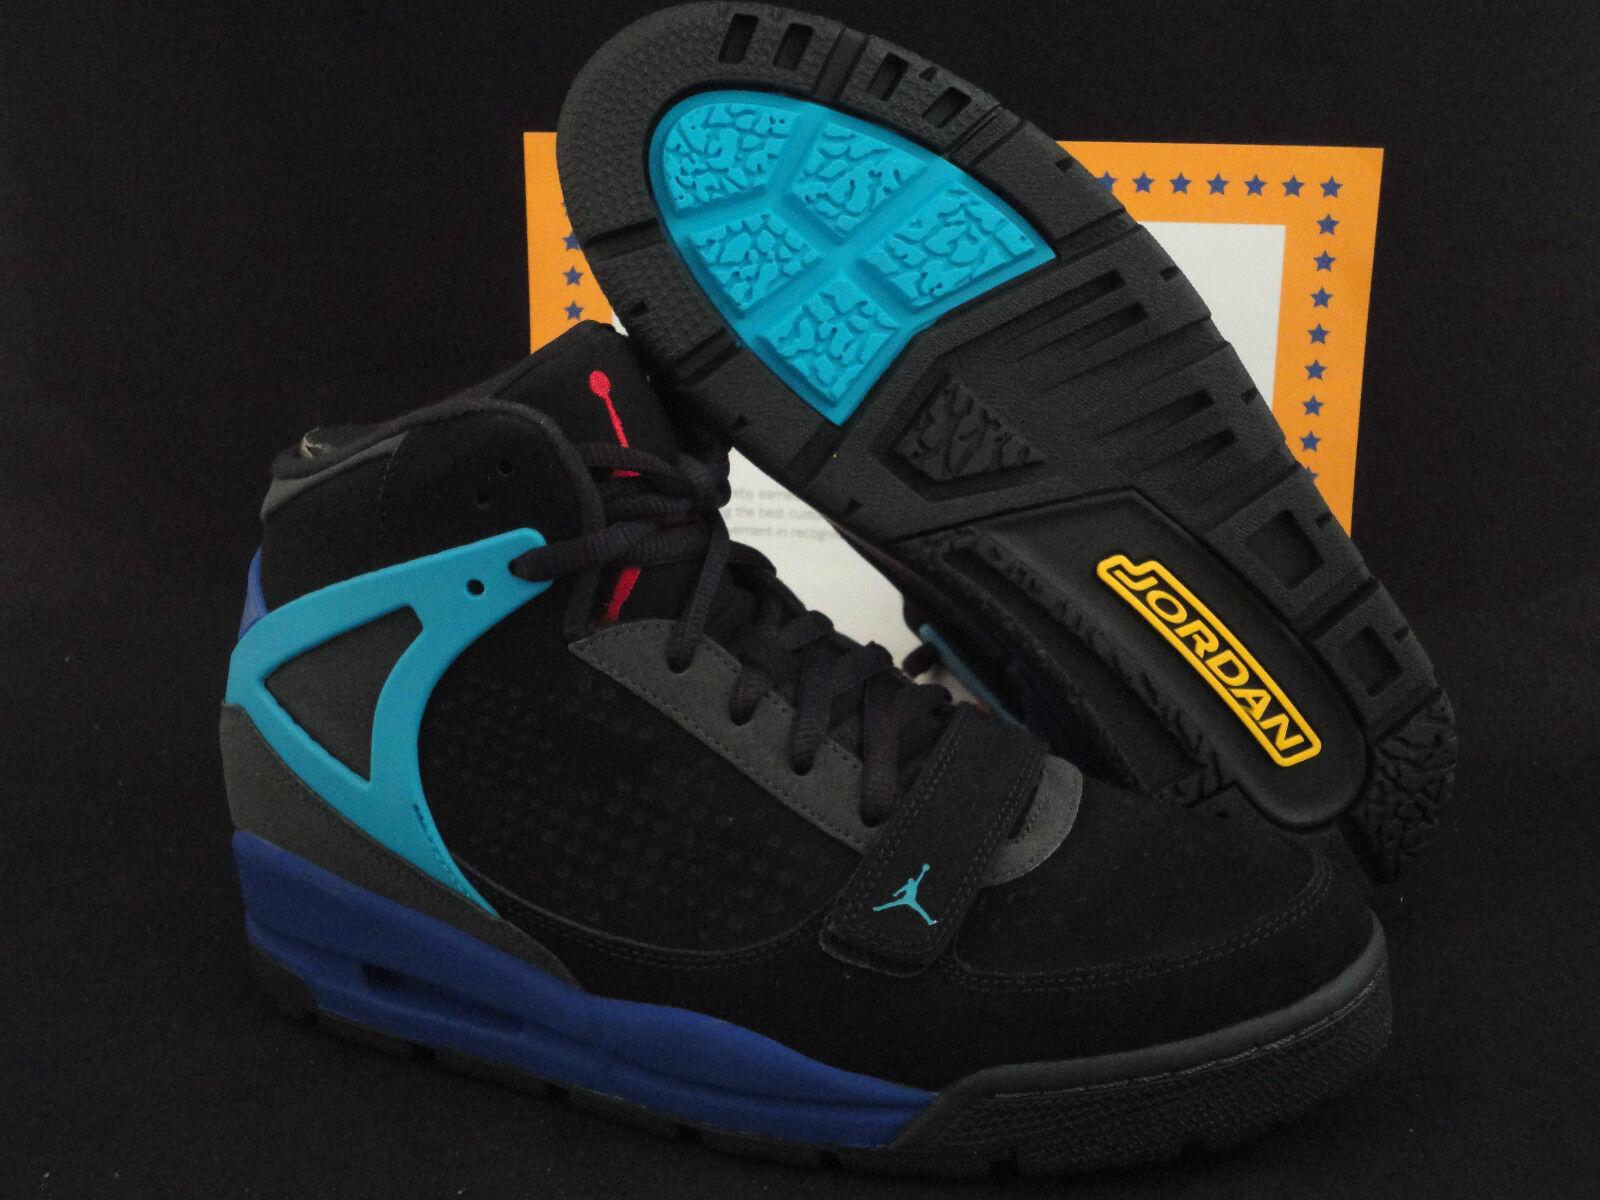 Nike Jordan Phase 23 Trek, Sz 14, Black Concord Aquatone The most popular shoes for men and women